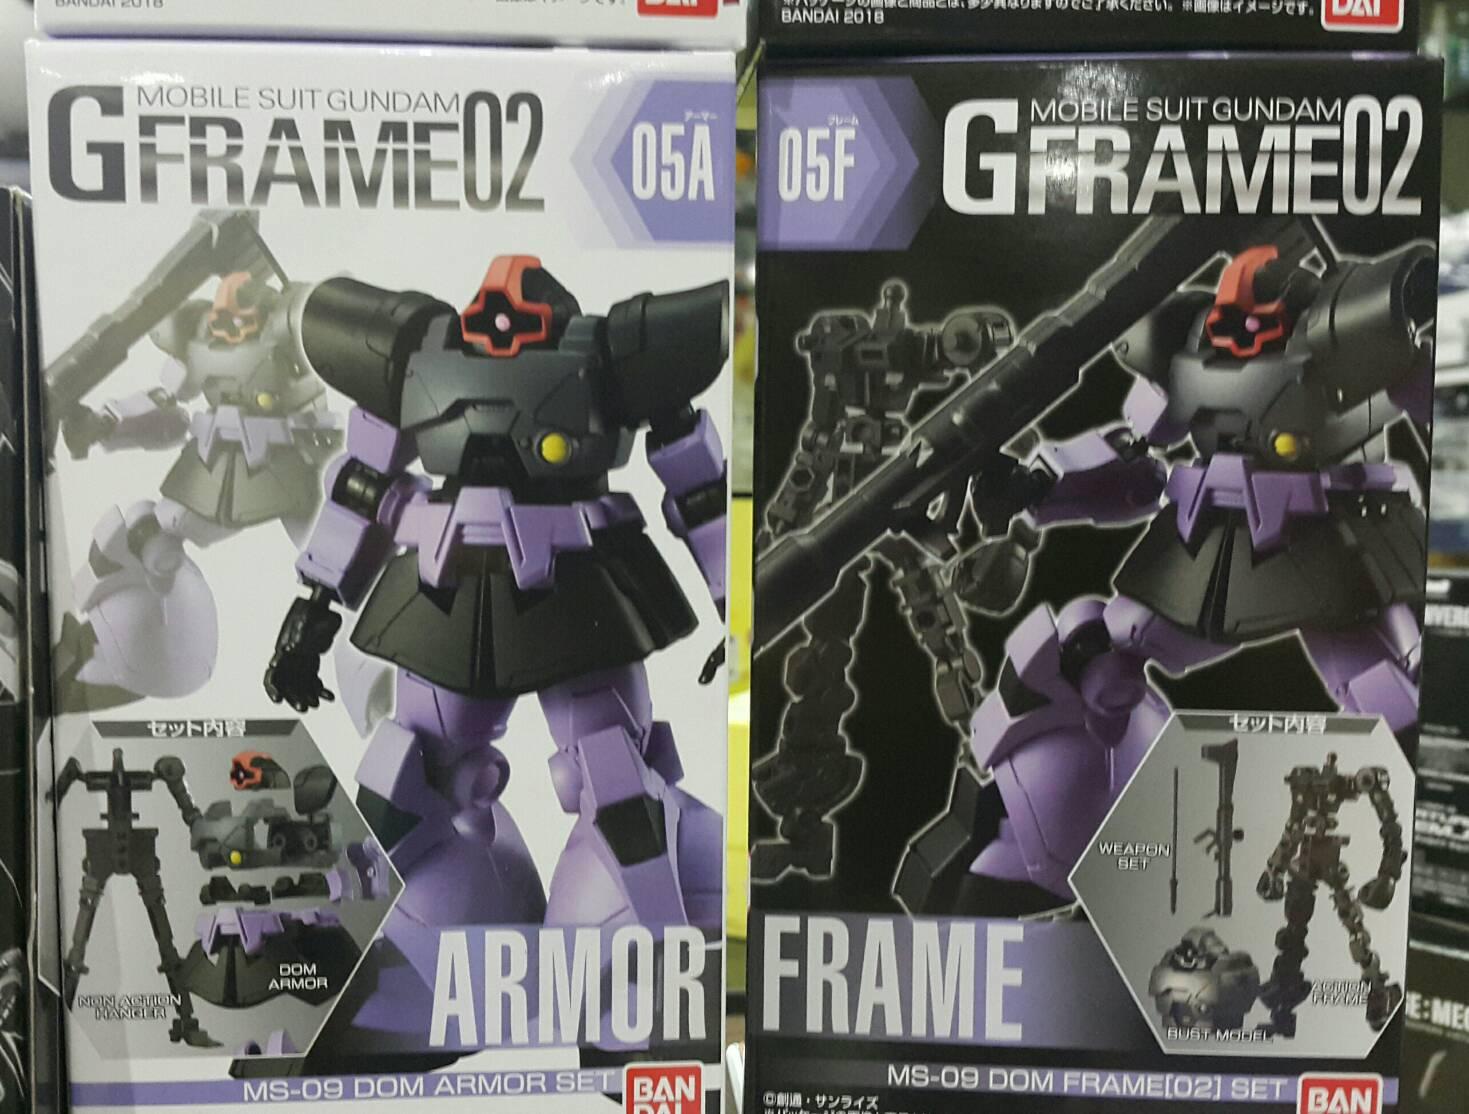 GF02 05 dom -MOBILE SUIT GUNDAM G FRAME 02